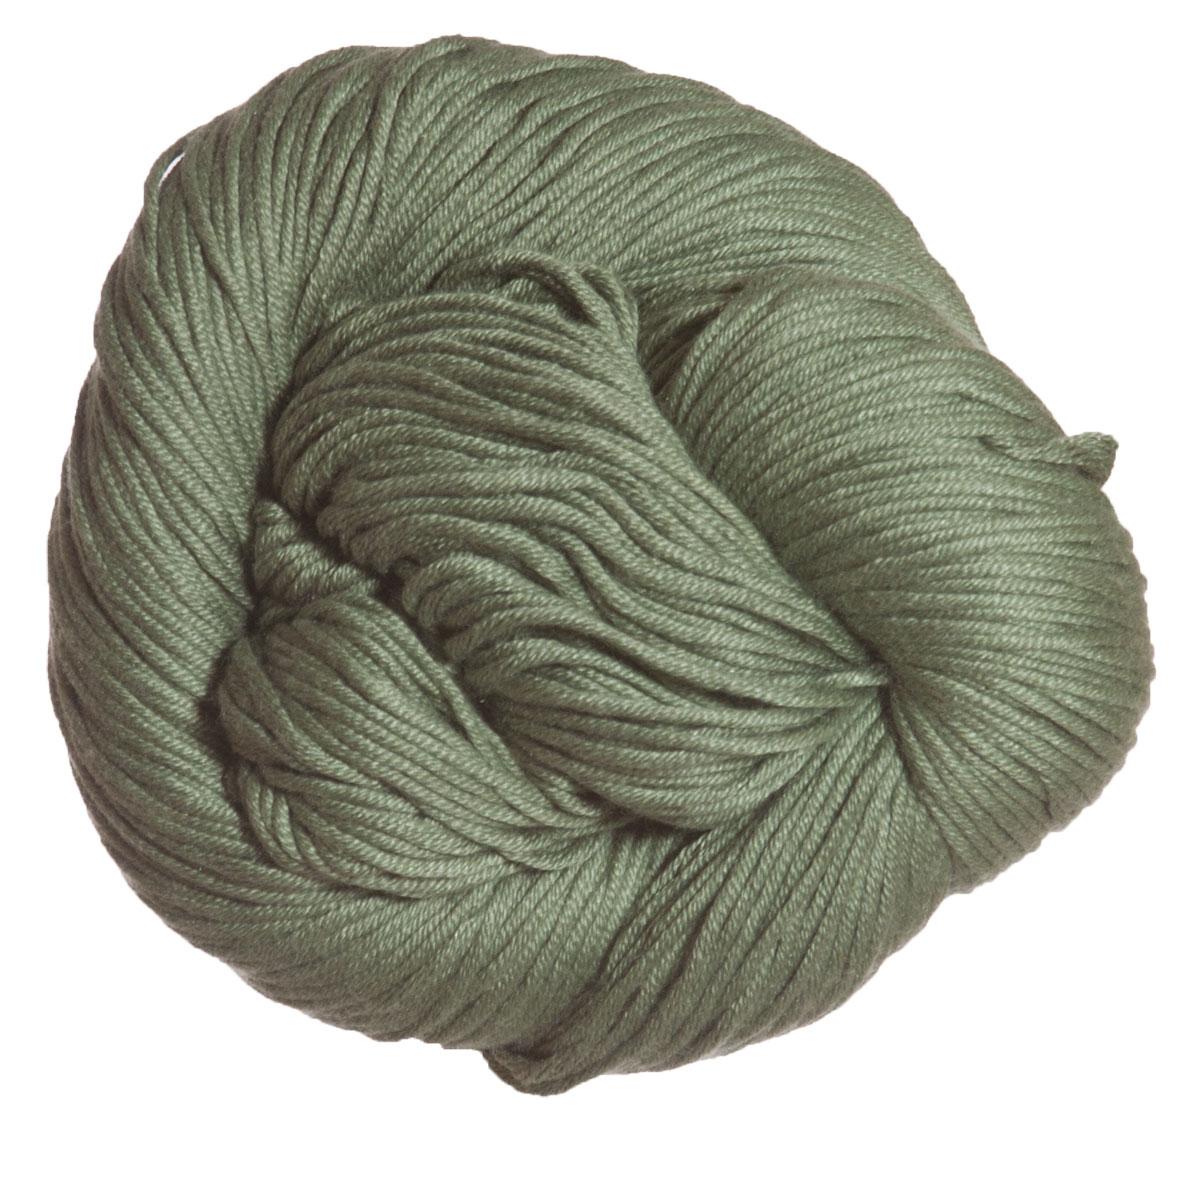 Modal Knitting Yarn : Berroco modern cotton yarn video reviews at jimmy beans wool